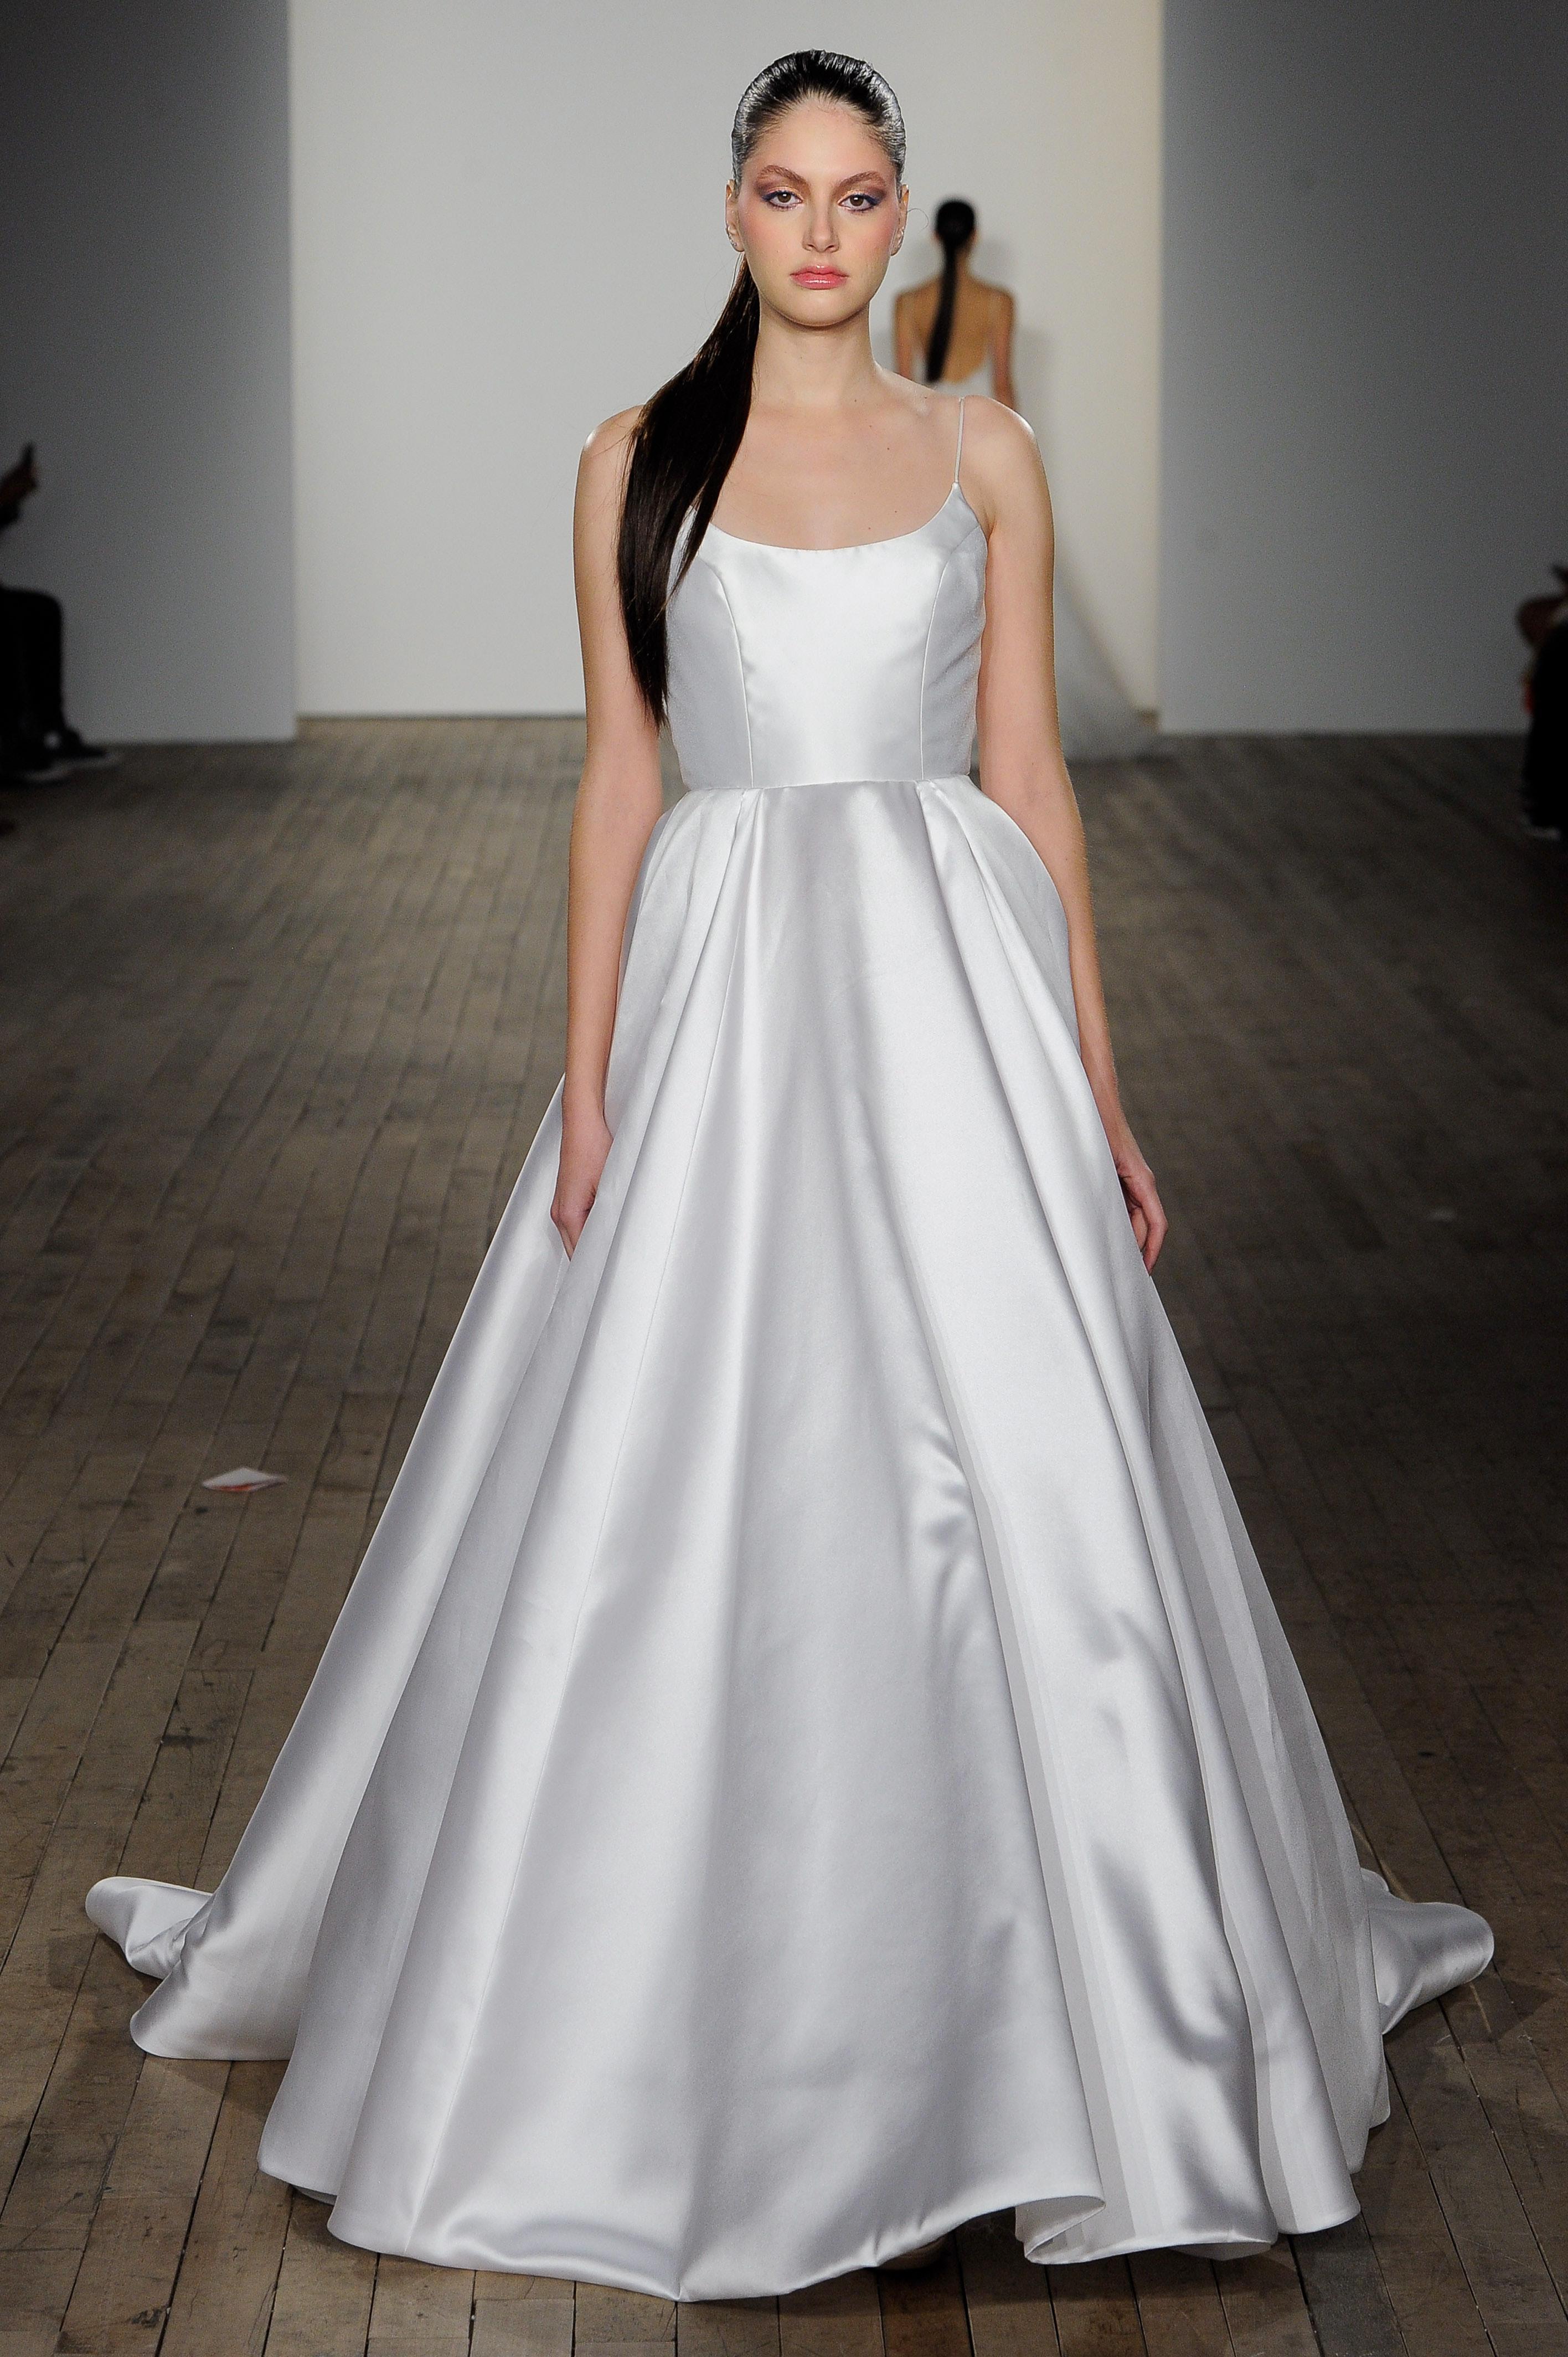 blush by hayley paige fall 2019 spaghetti strap ball gown wedding dress